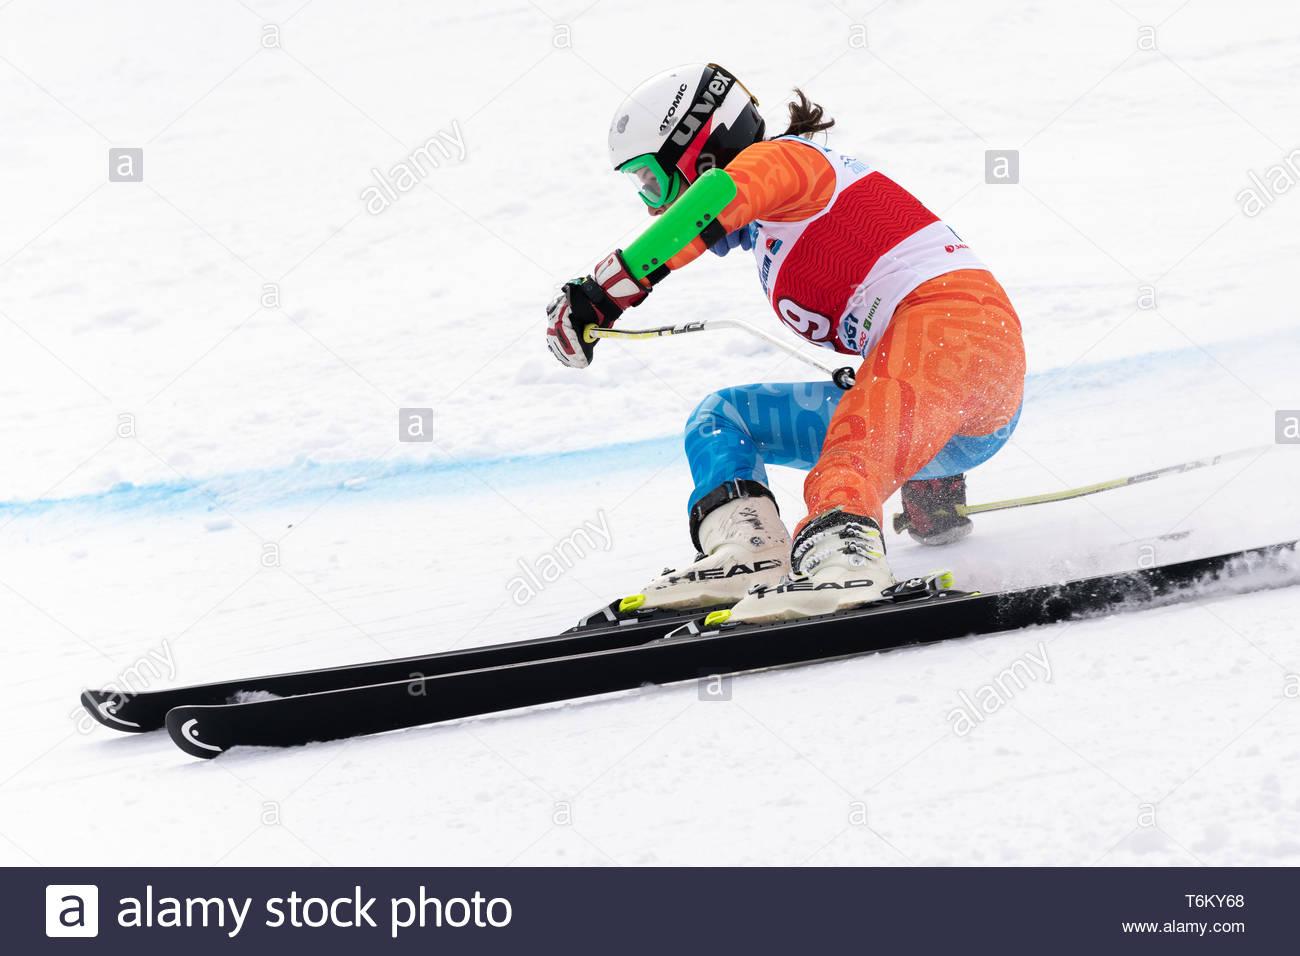 KAMCHATKA PENINSULA, RUSSIA - APR 2, 2019: Mountain skier Victoria Fugleva (Sakhalin Region) skiing down mount. International Ski Federation Champions - Stock Image